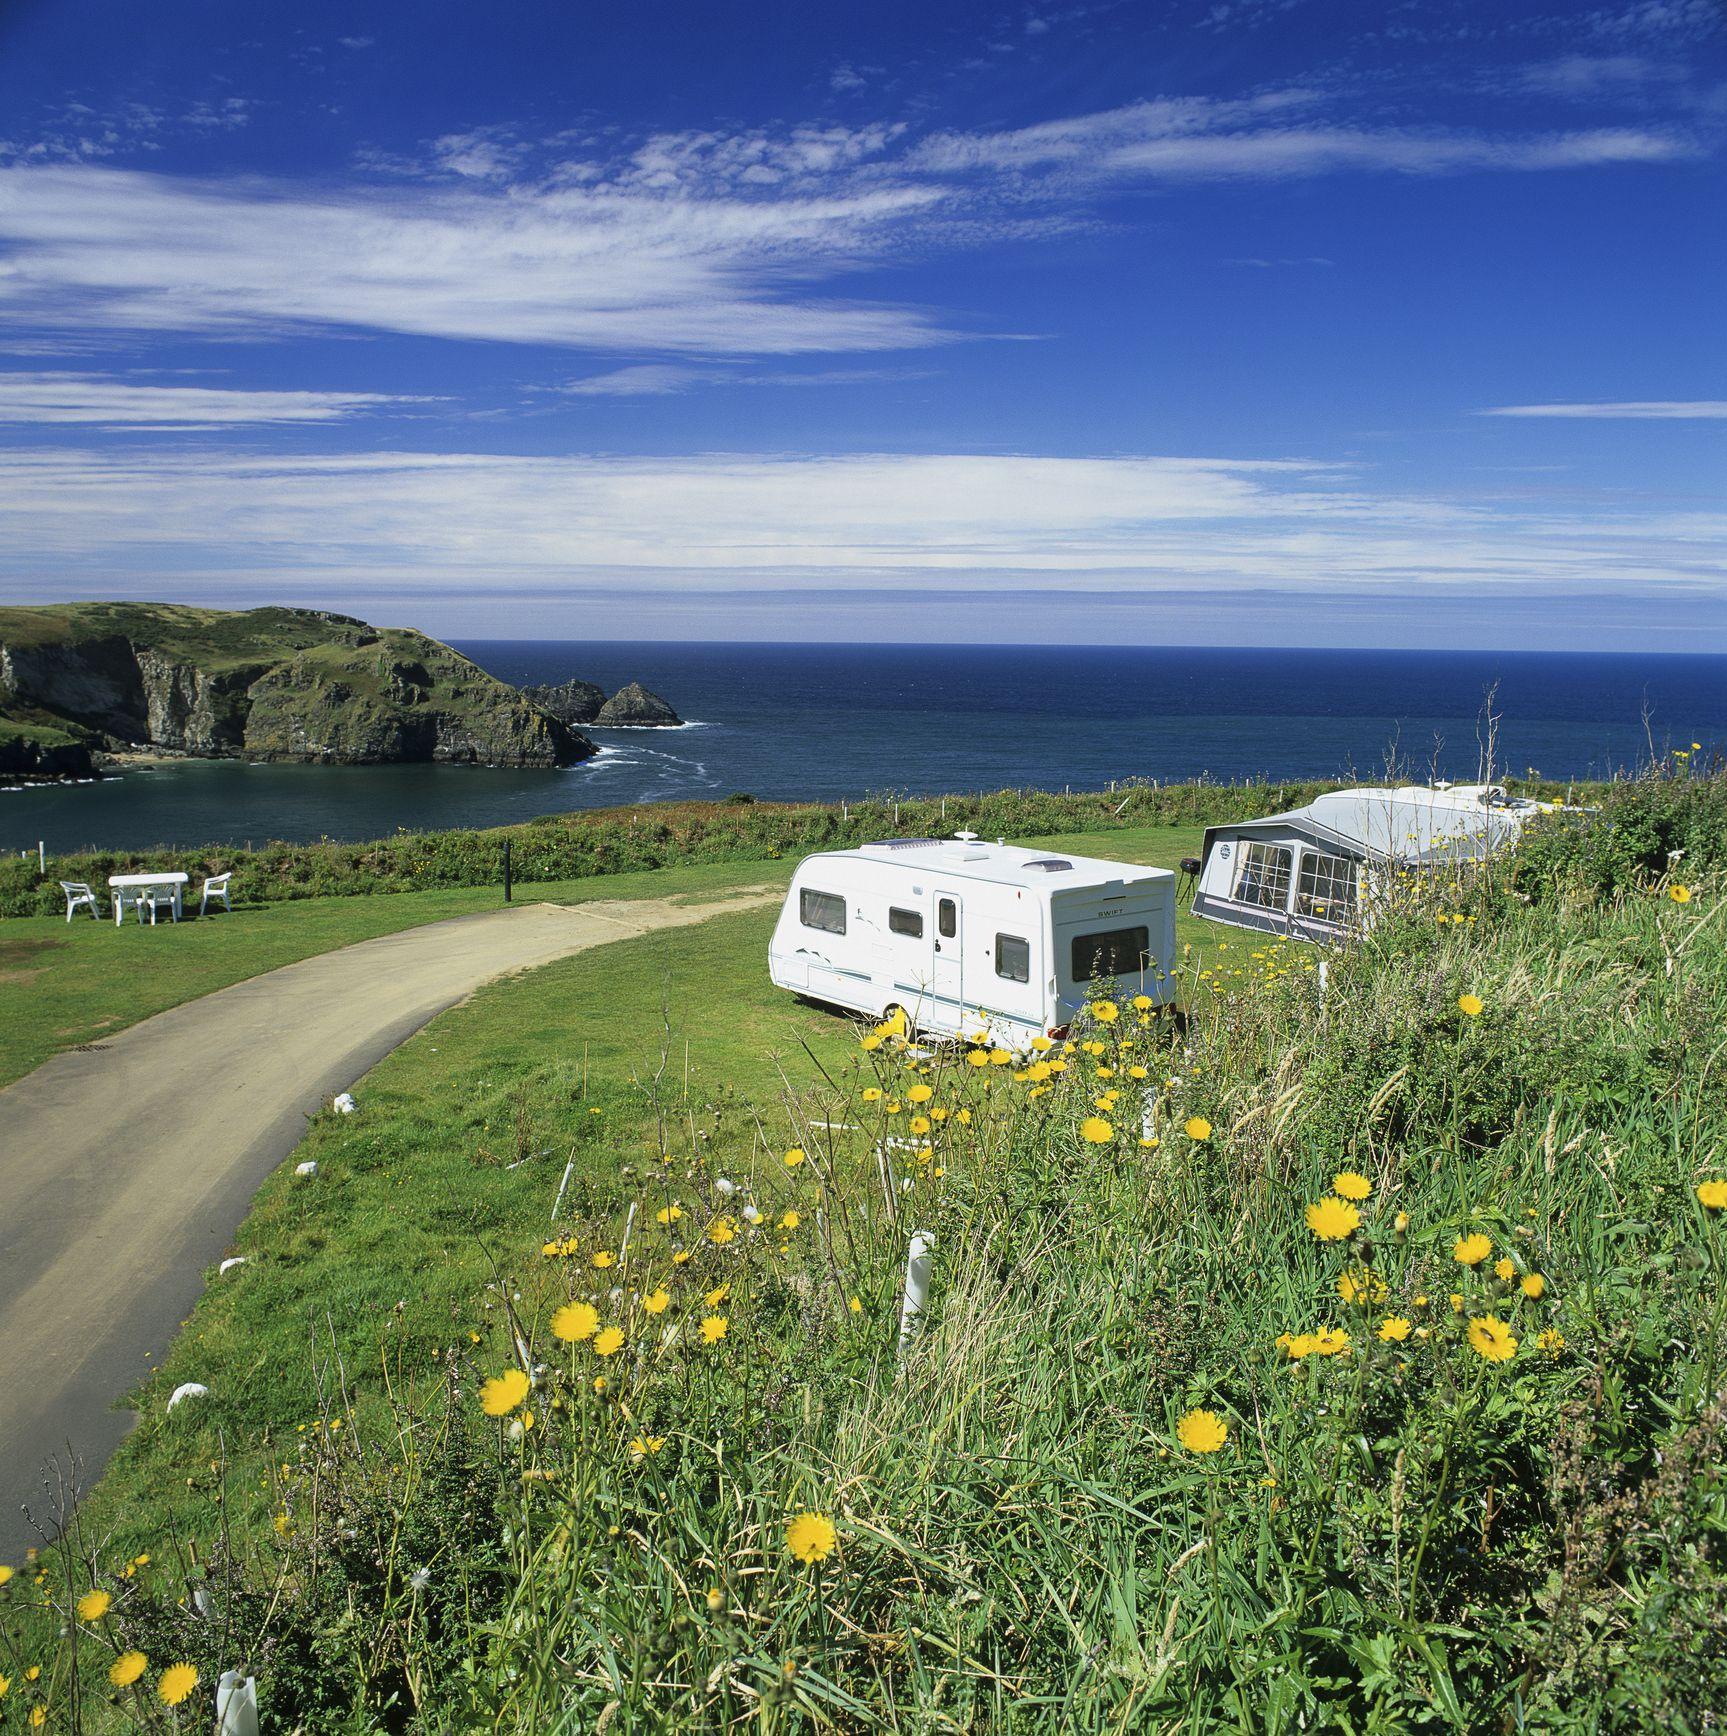 All inclusive caravan holidays abroad